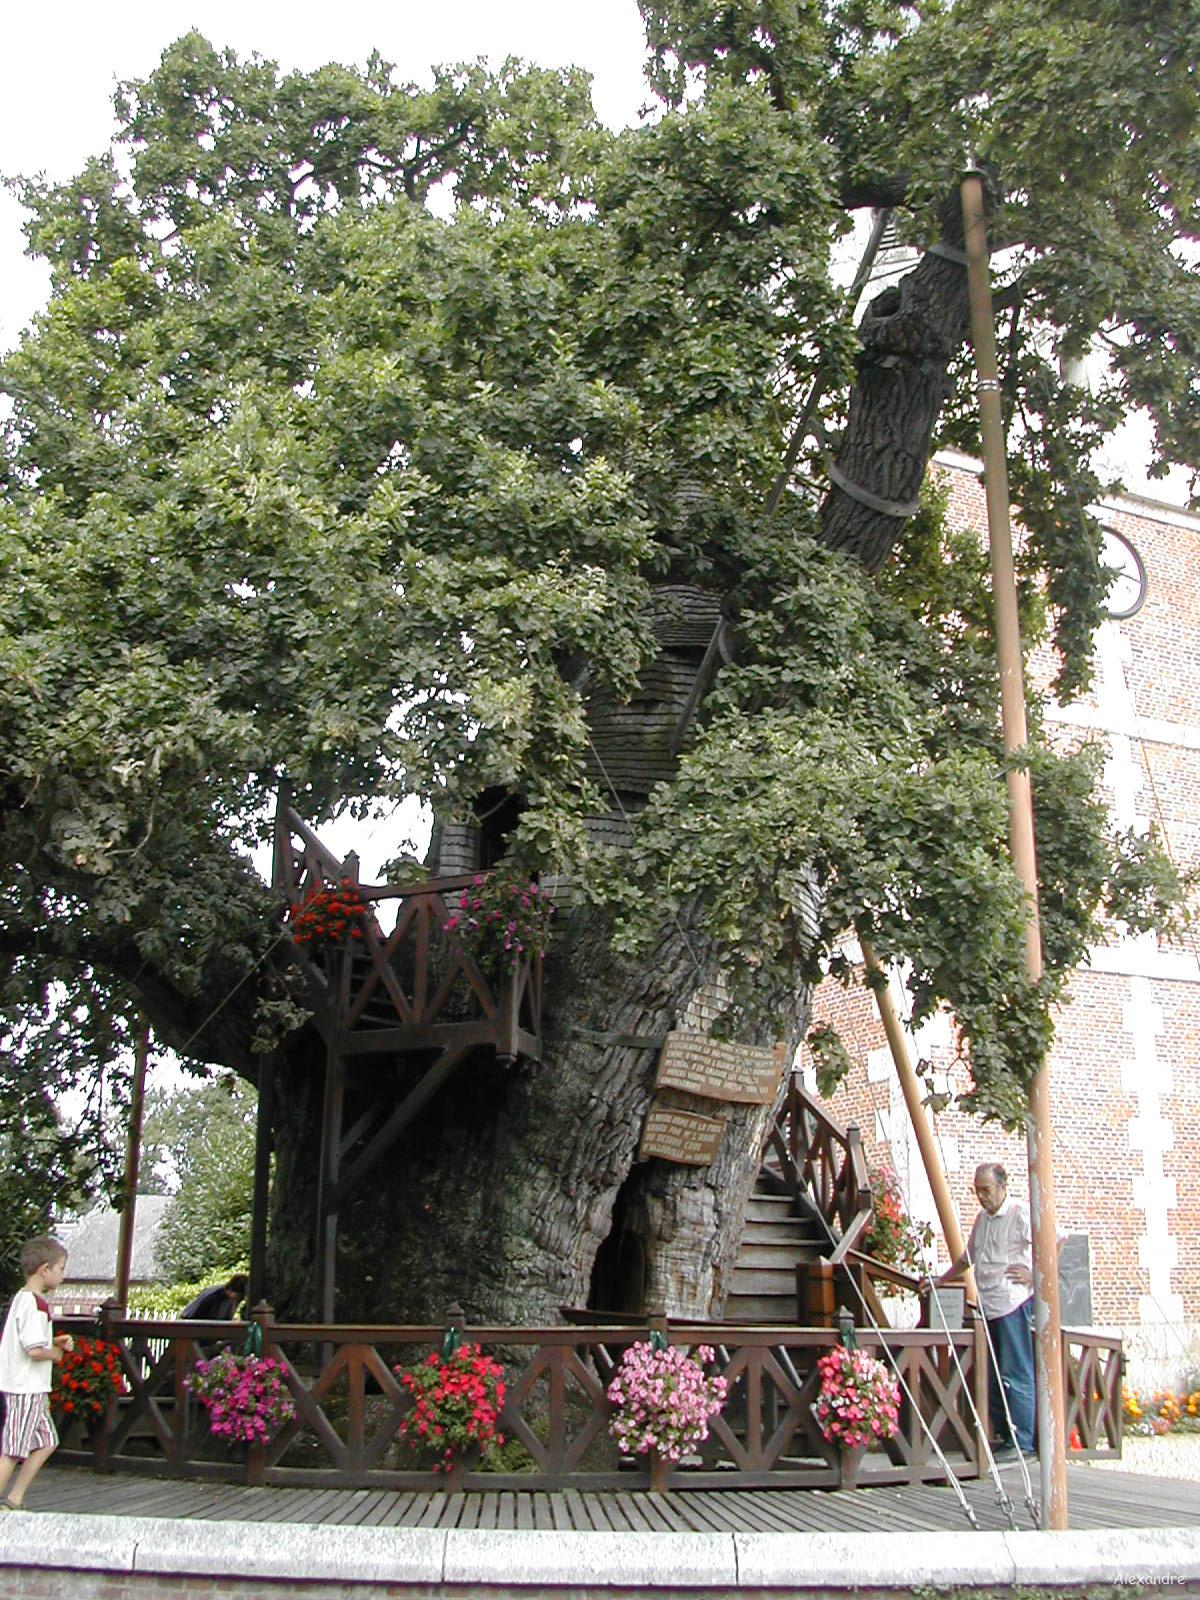 Chene Chapel Allouville